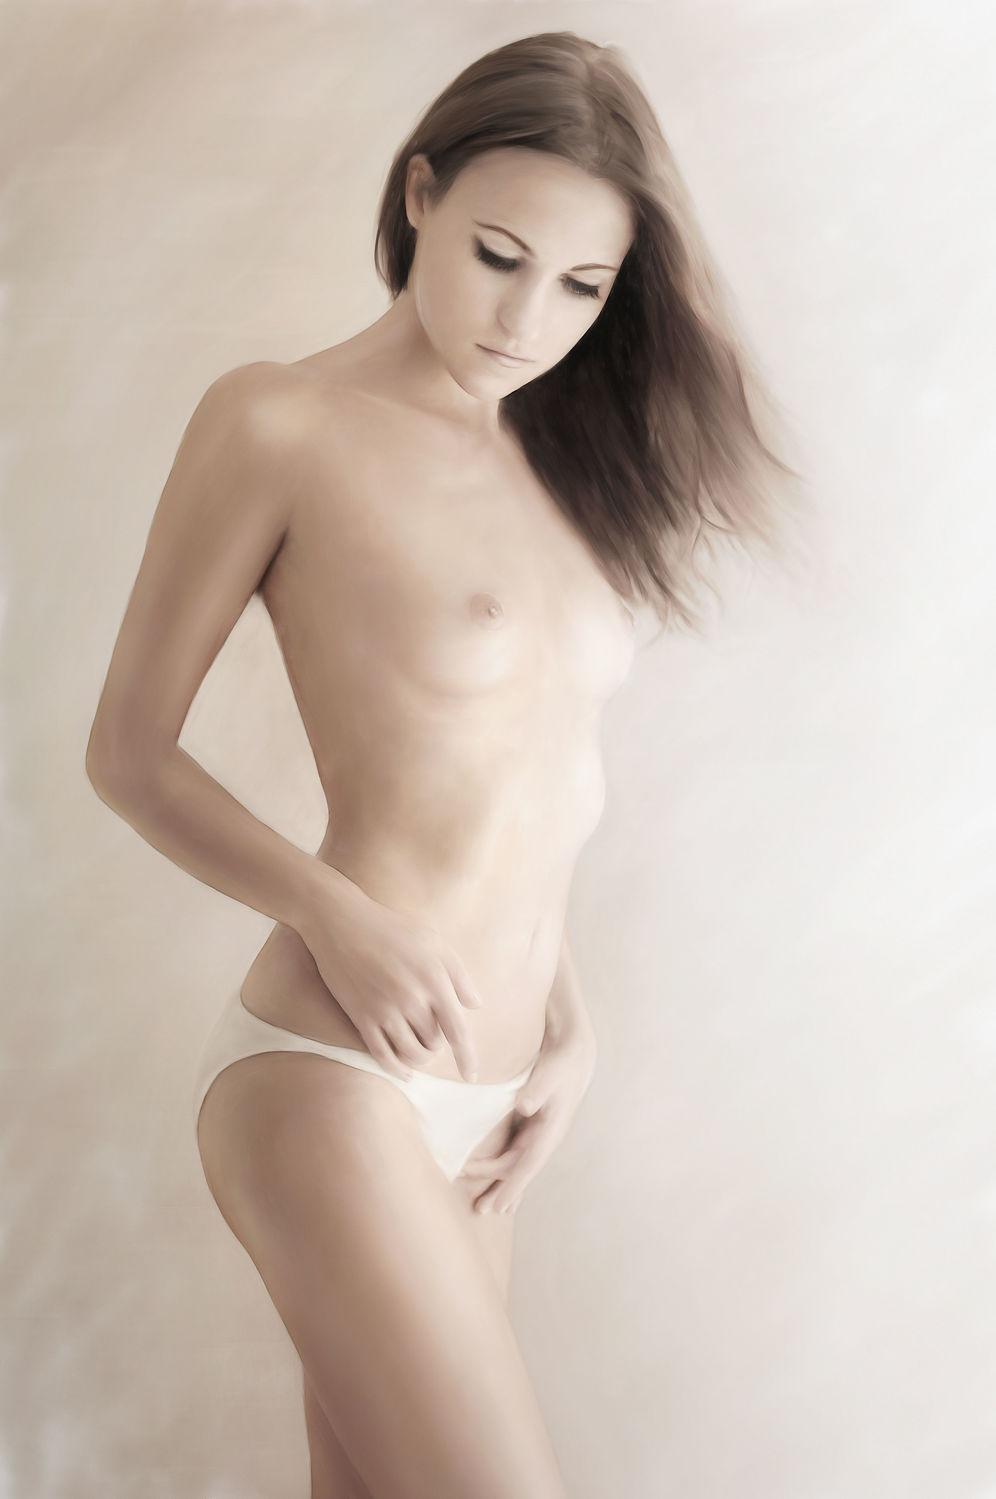 Bild mit nude, Akt, Schönheit, Frau, nackt, beauty, Hell, pastell, Mädchen, ästhetik